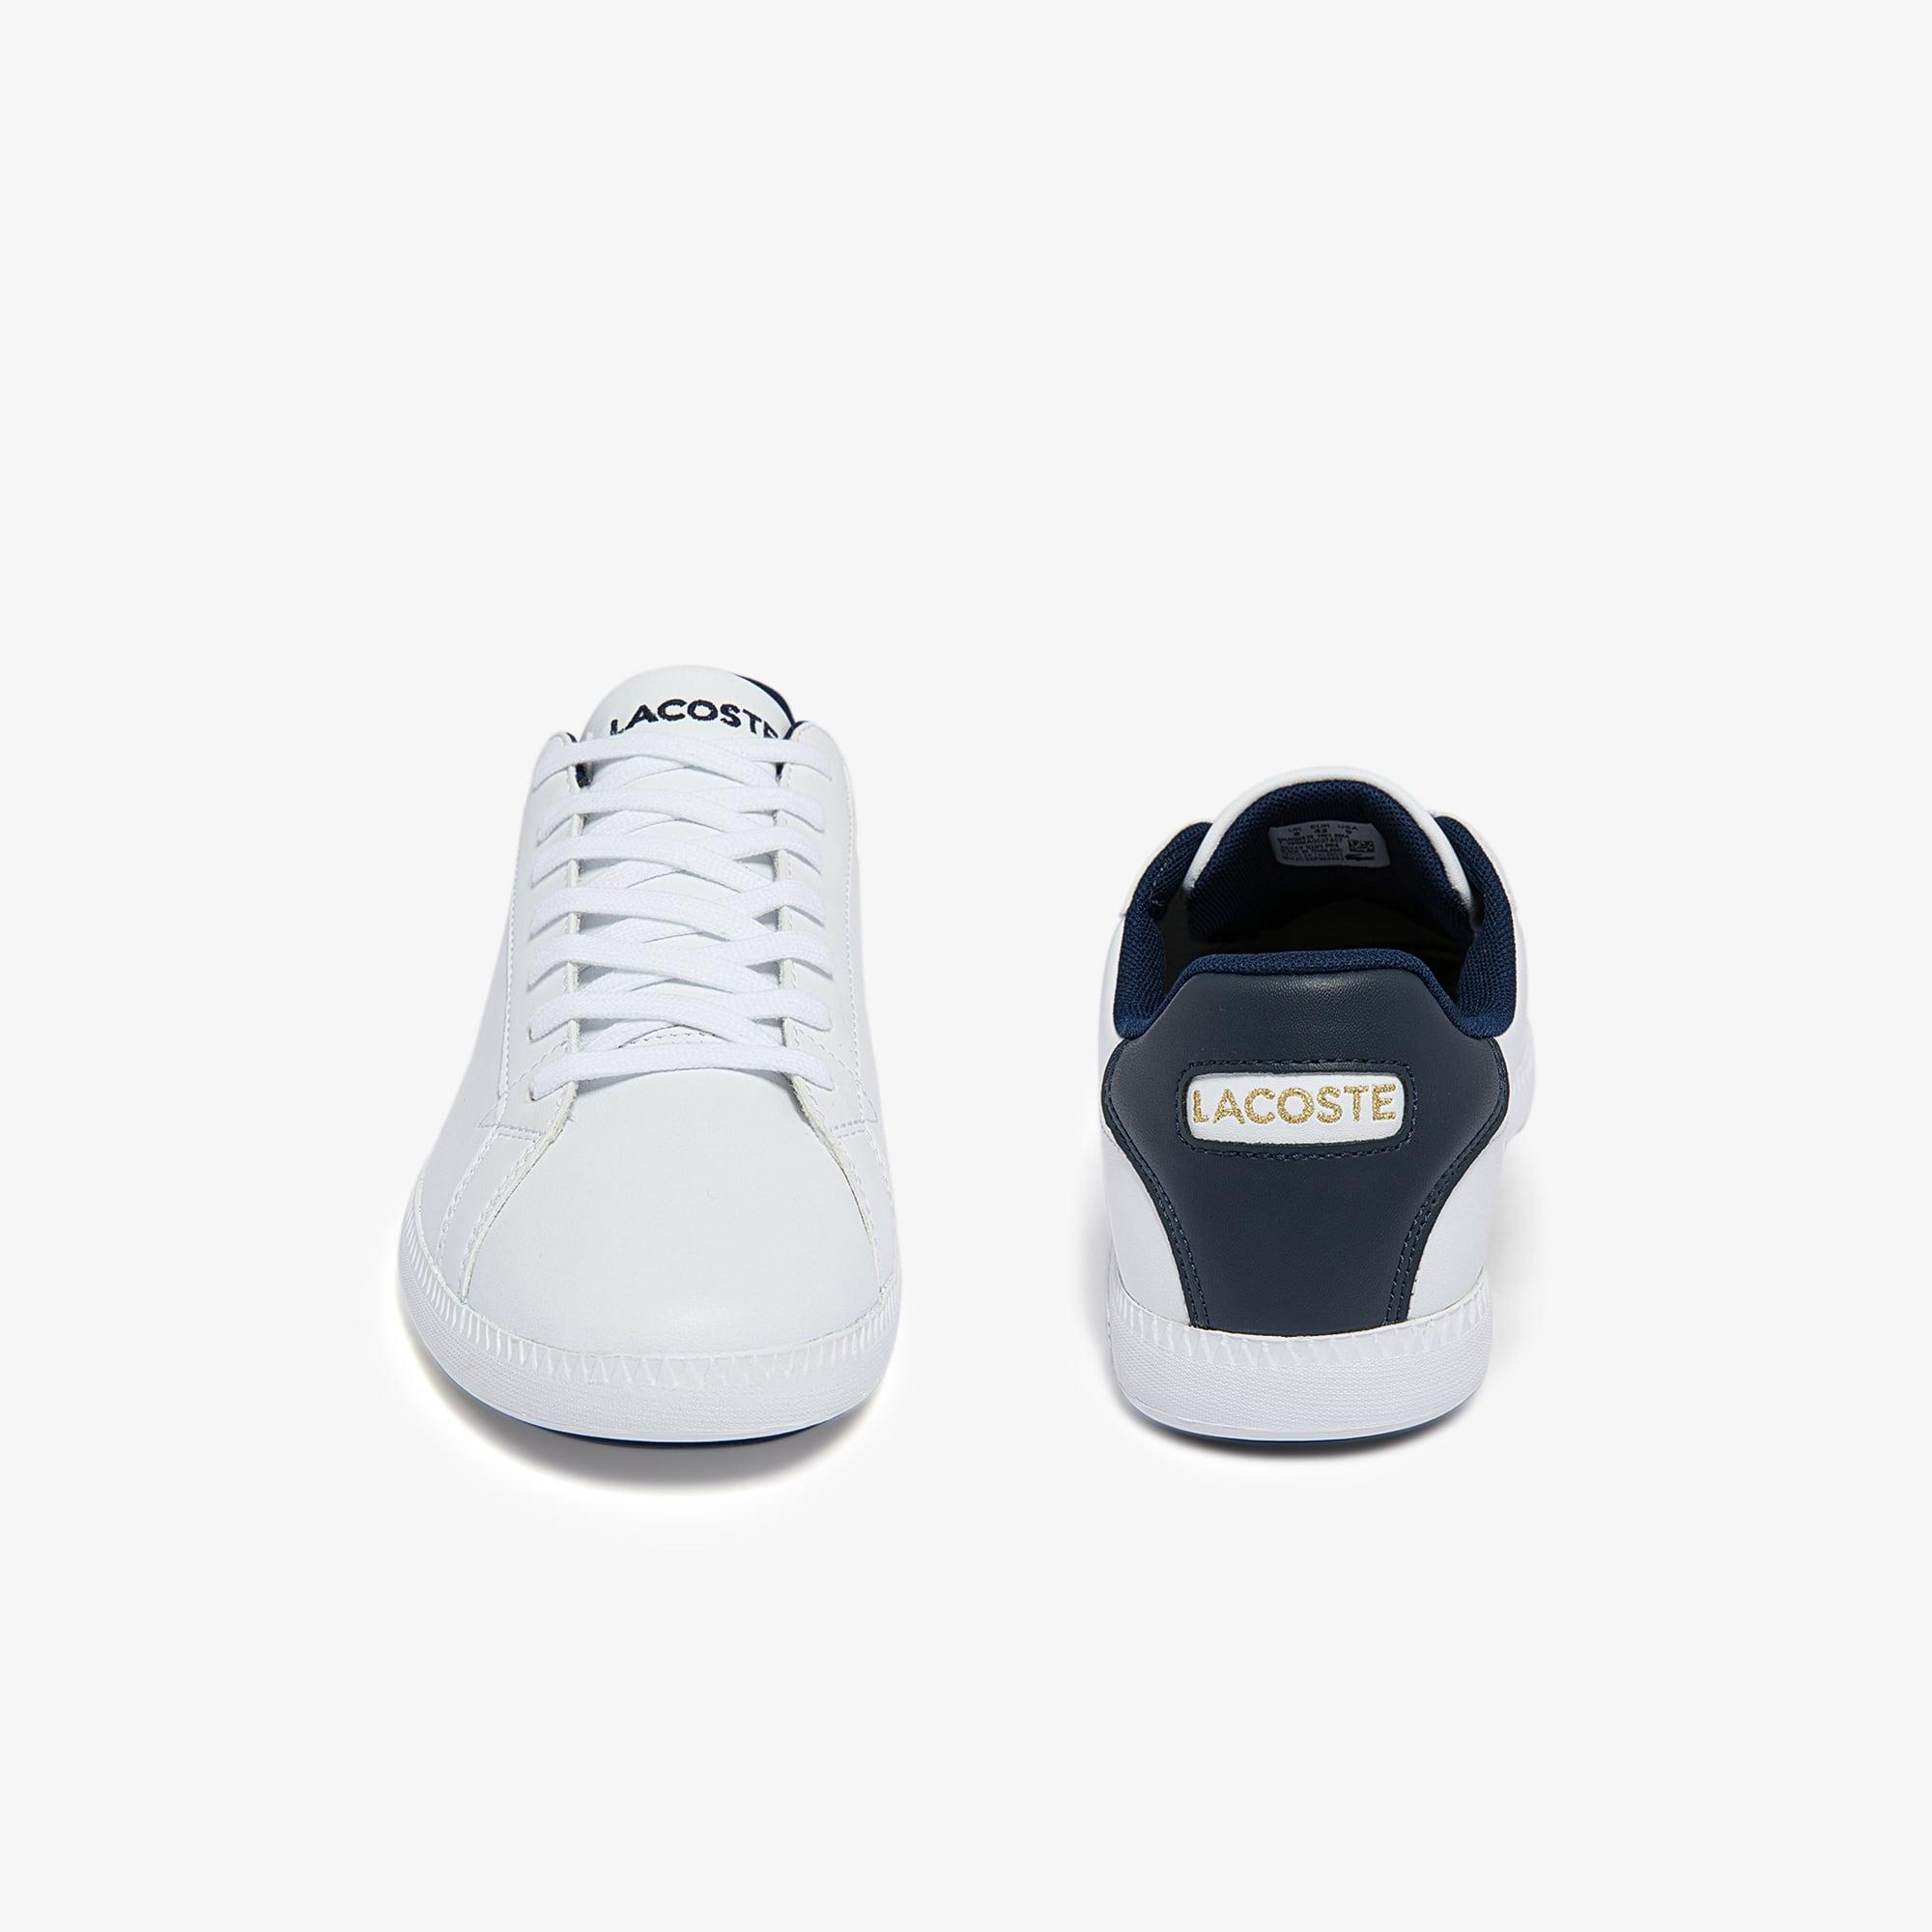 Lacoste Graduate tri1 Blanc 739sma0027407 Hommes Fashion Sneaker Chaussures De Loisirs